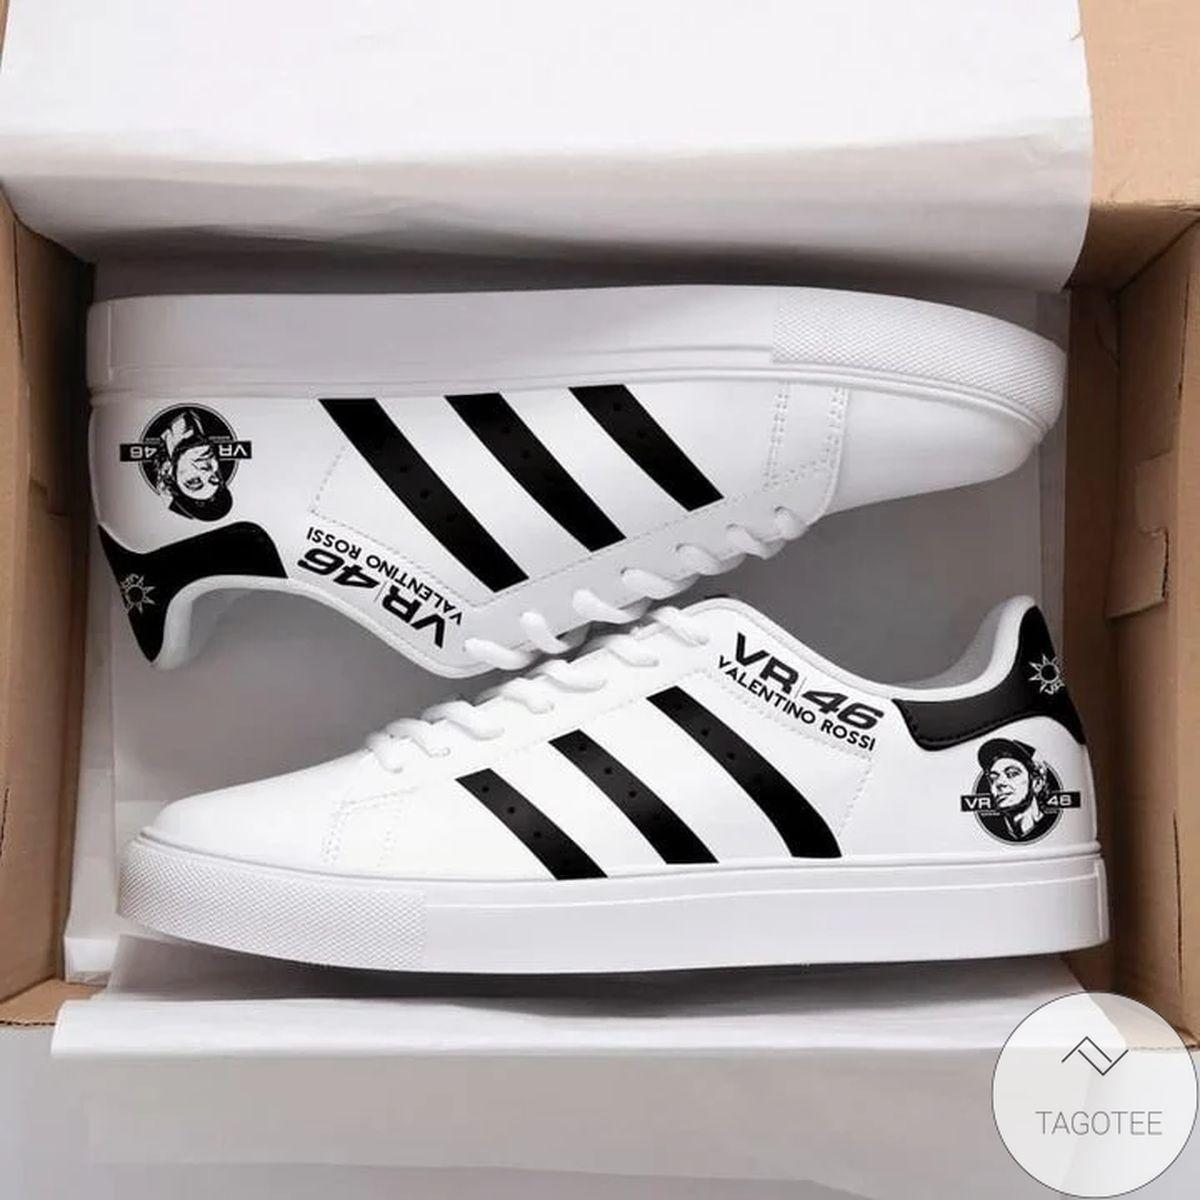 Fantastic Valentino Rossi Vr46 White Stan Smith Shoes